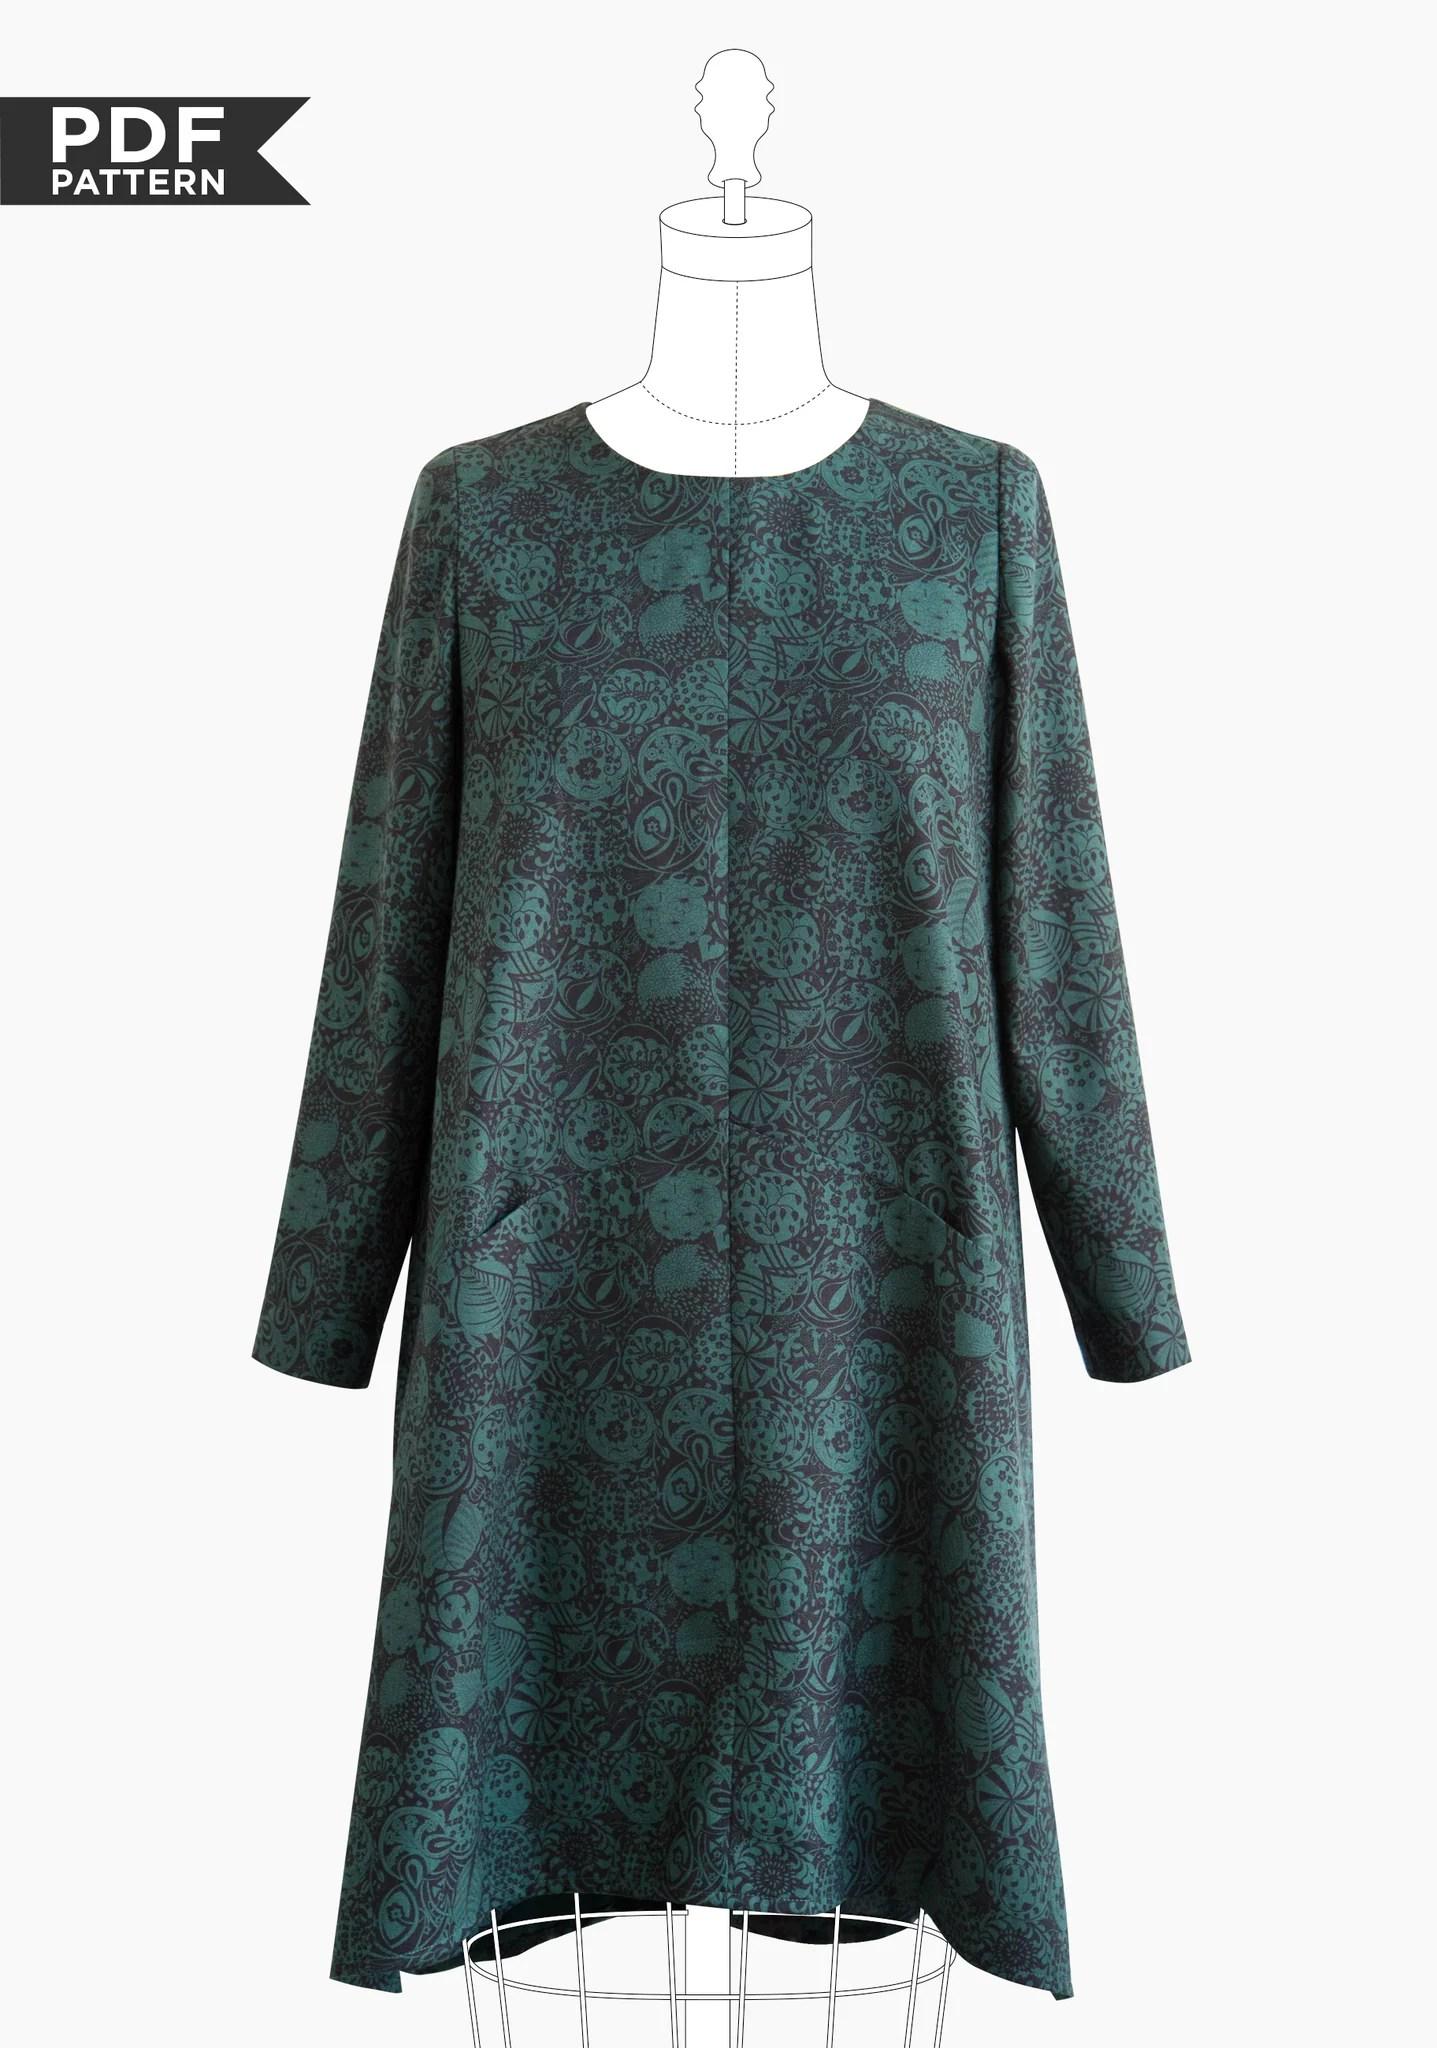 Grainline's new Farrow dress (click to go to pattern)